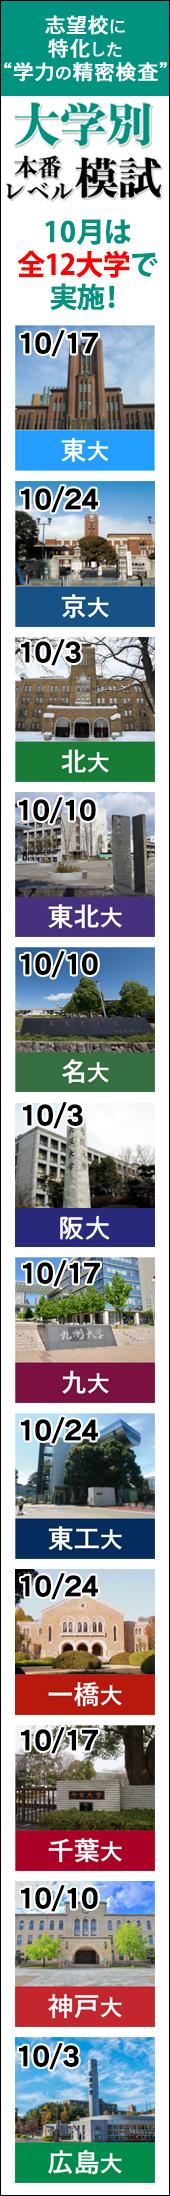 大学別本番レベル模試(右)